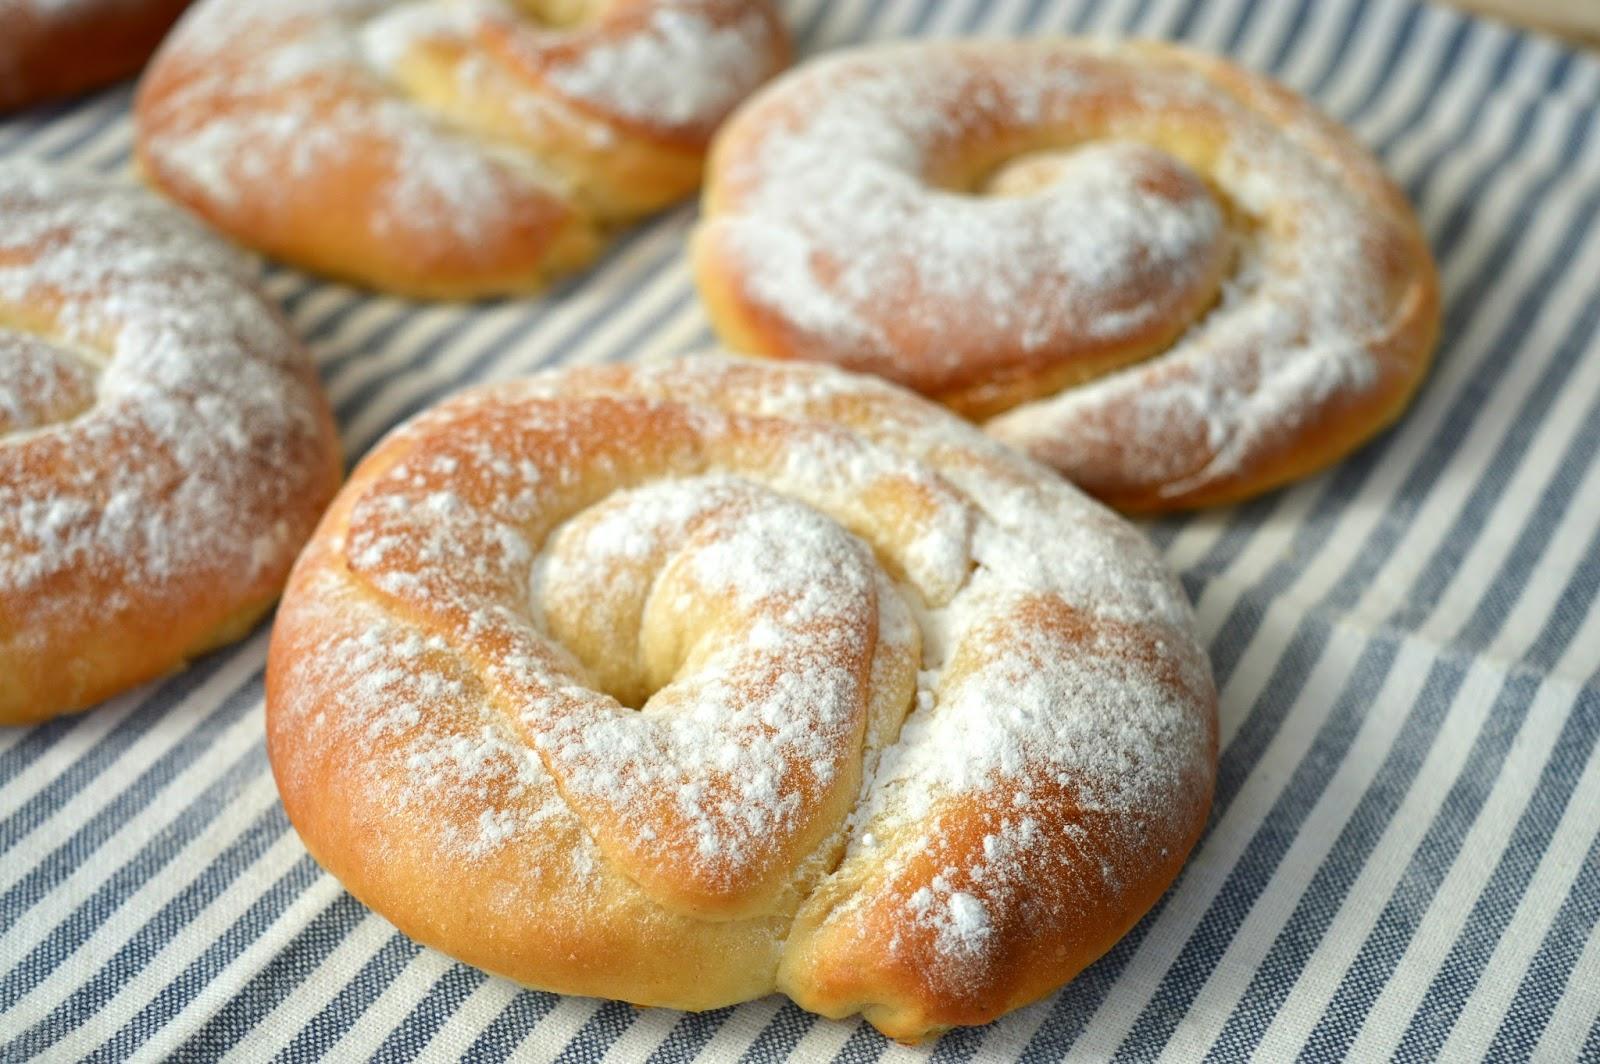 Favoriete Ellouisa: Ensaimadas - Spaanse opgerolde zoete broodjes @NK76